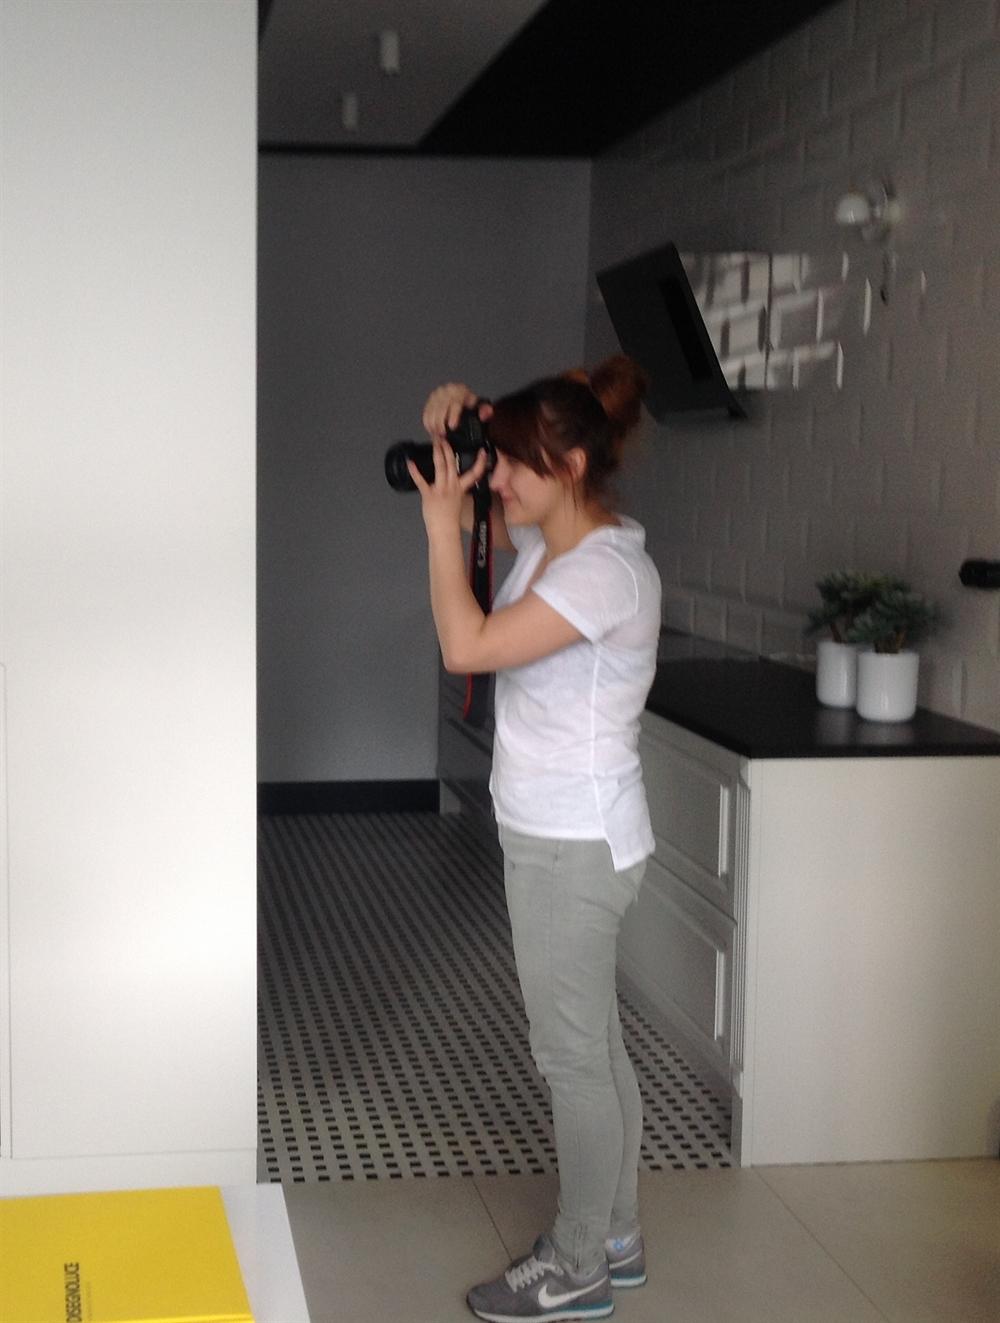 4 bloggirls decoroom warsztaty aranzacji projektowanie wnetrz interior design workshops apartment arrangement home ideas